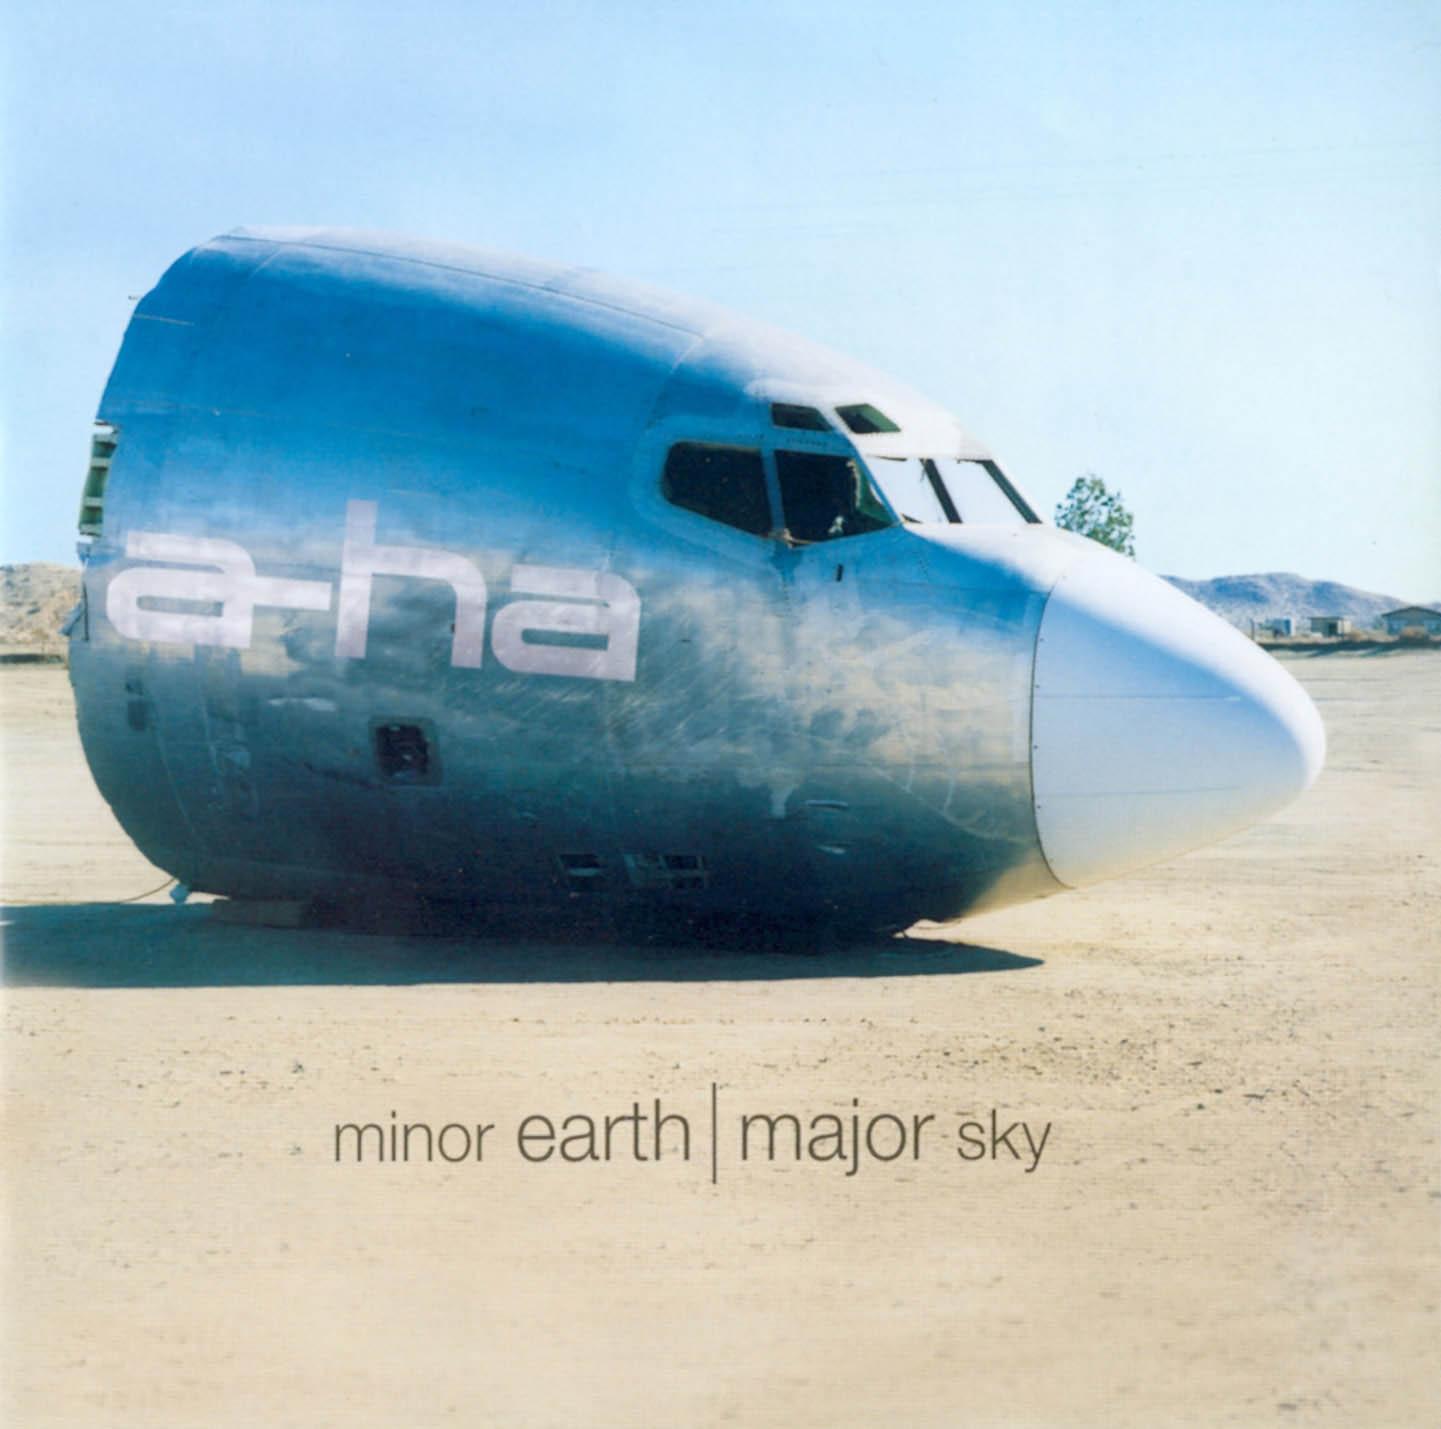 Minor earth / Major sky